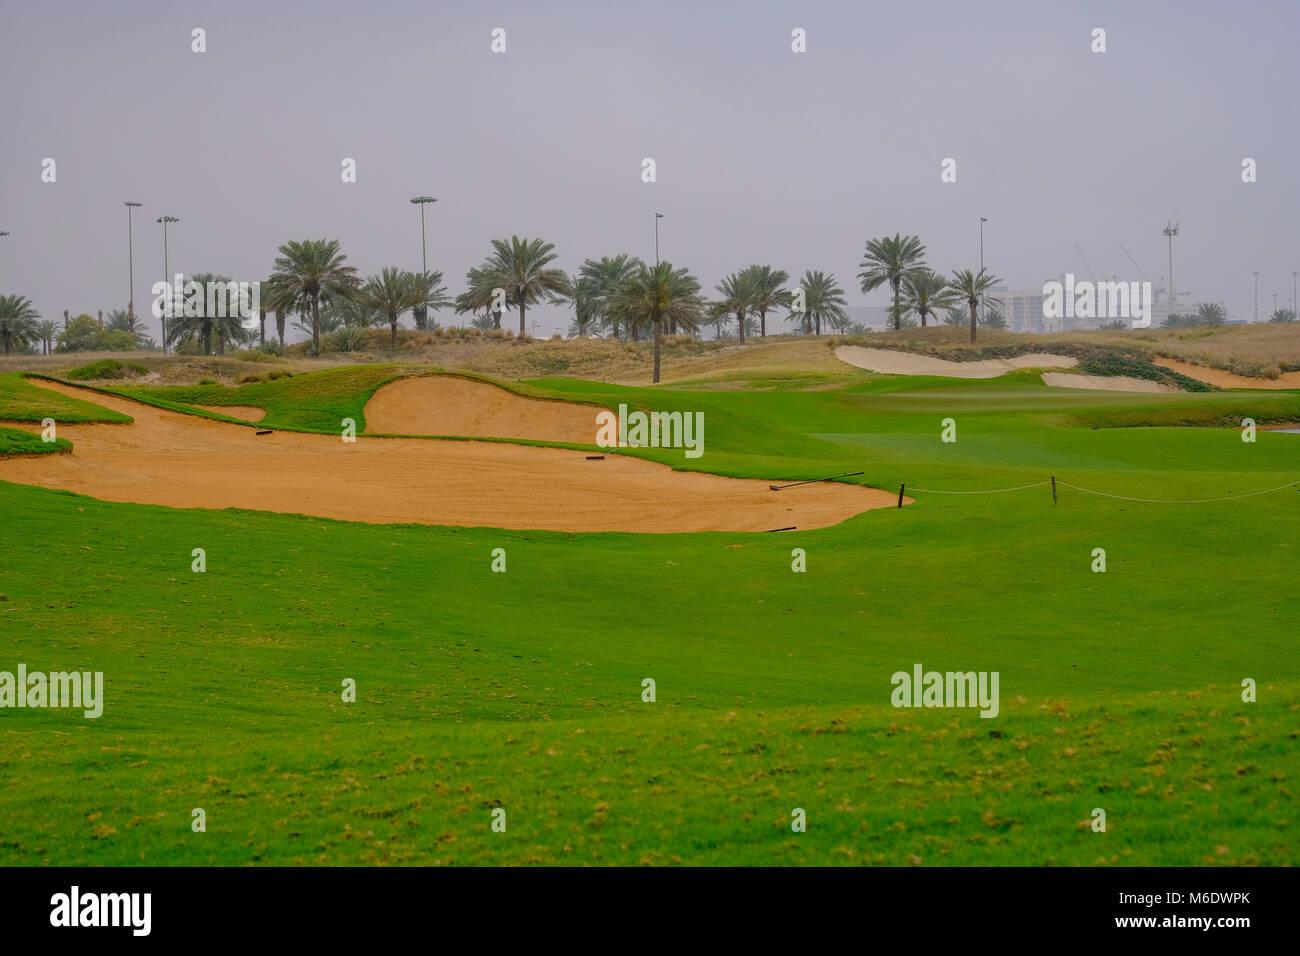 Saadiyat Beach Golf Course, 18 Hole, Par 4, Saadiyat Island Abu Dhabi - Stock Image